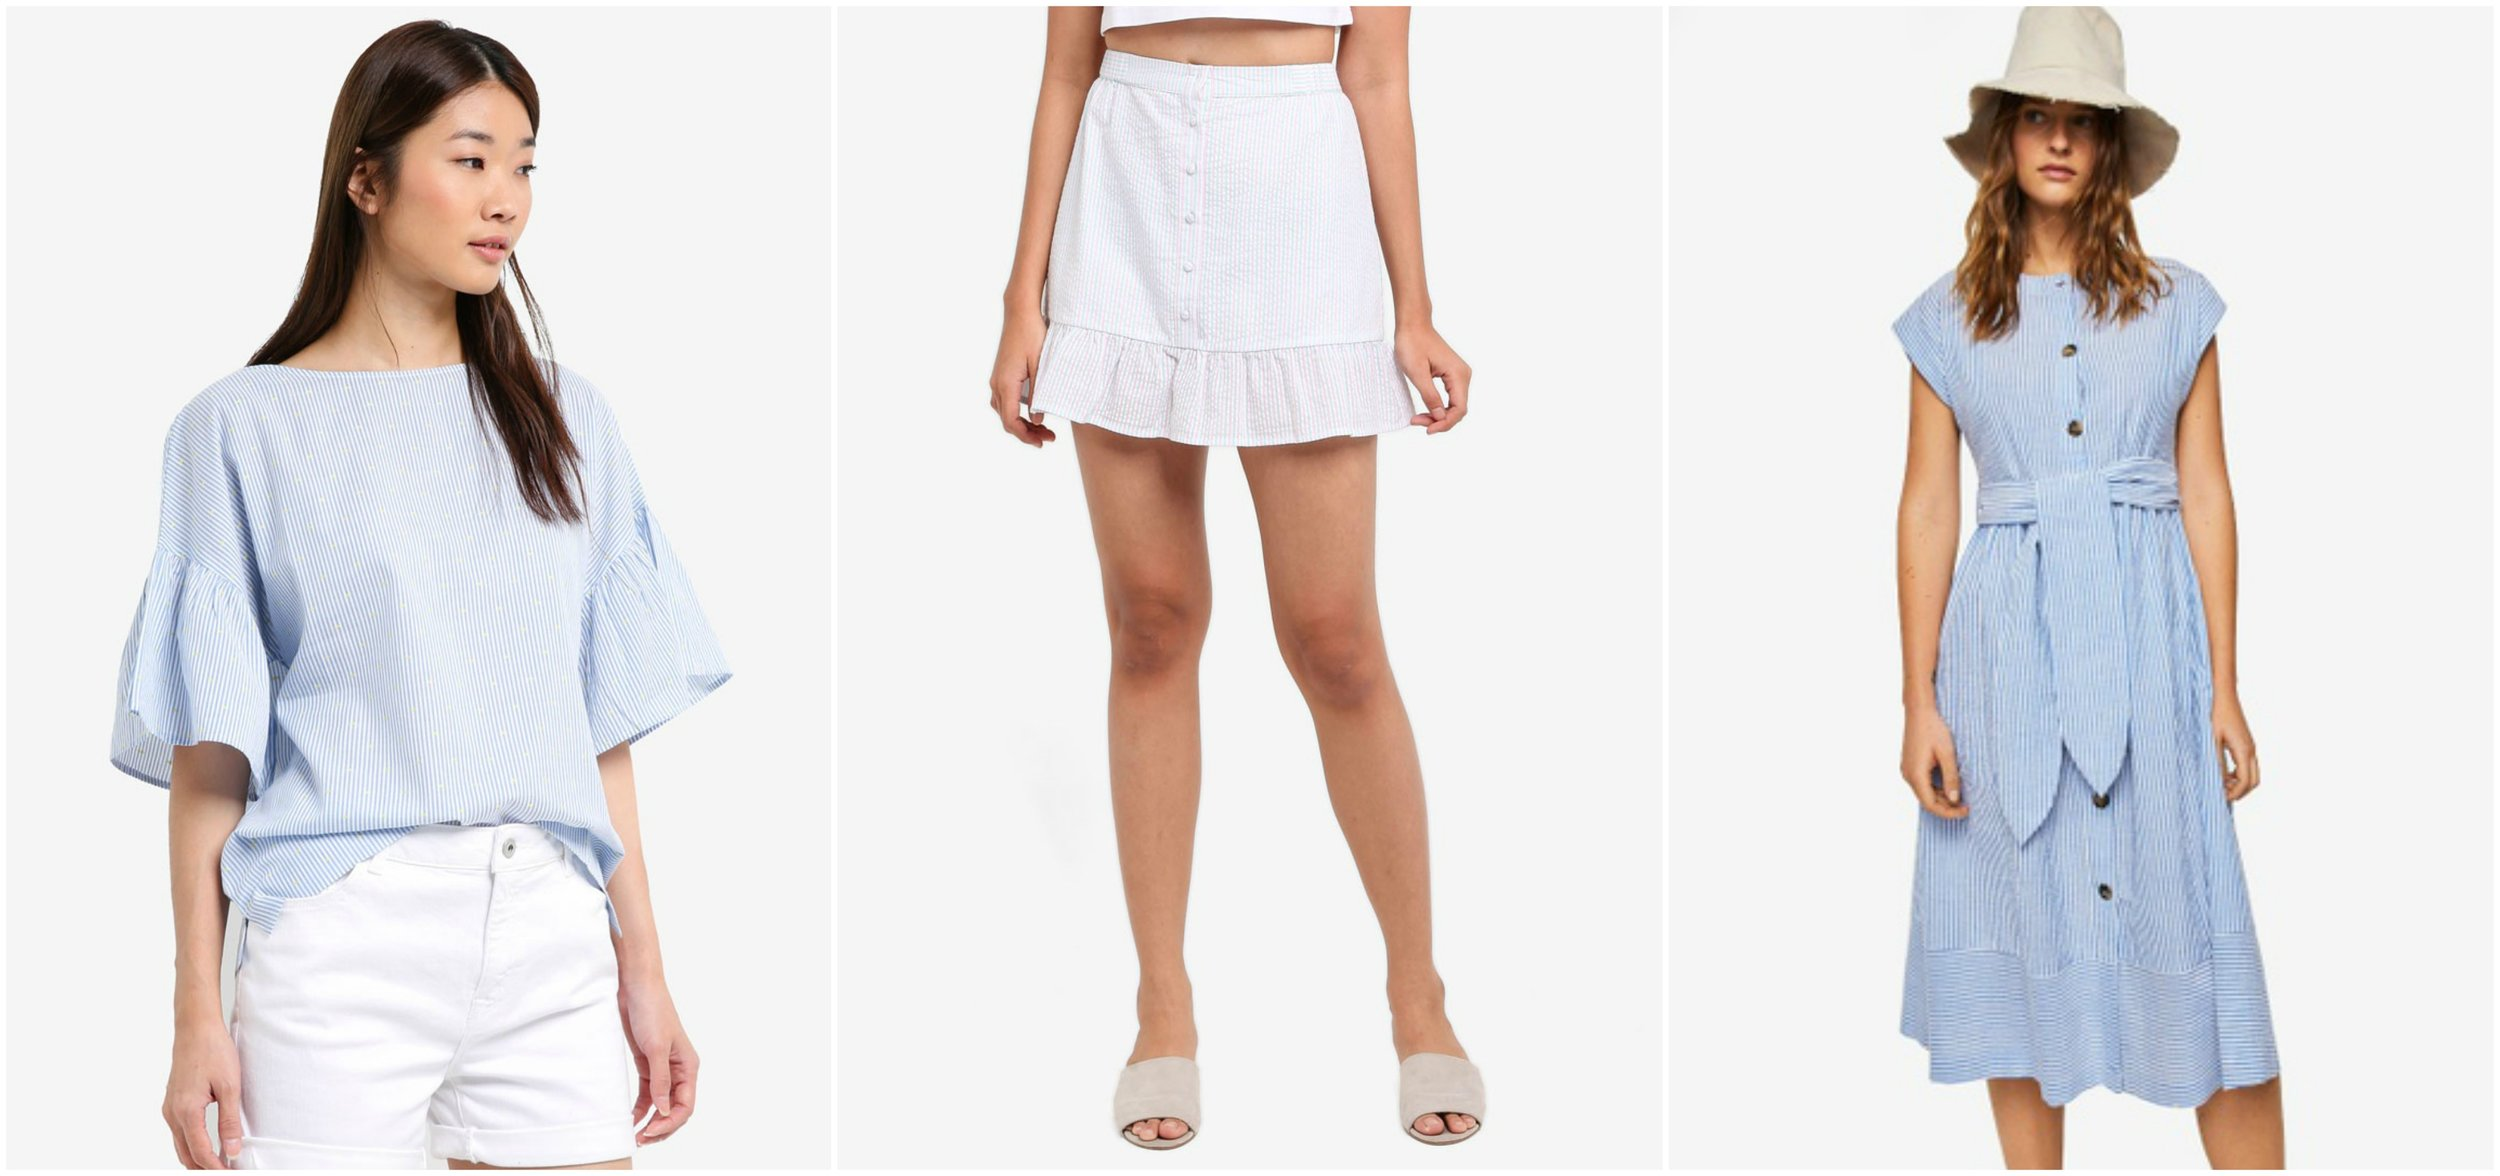 ESPRIT Woven Short Sleeve Blouse  ,  SOMETHING BORROWED Button Down Flare Mini Skirt , MANGO Stripe Textured Dress